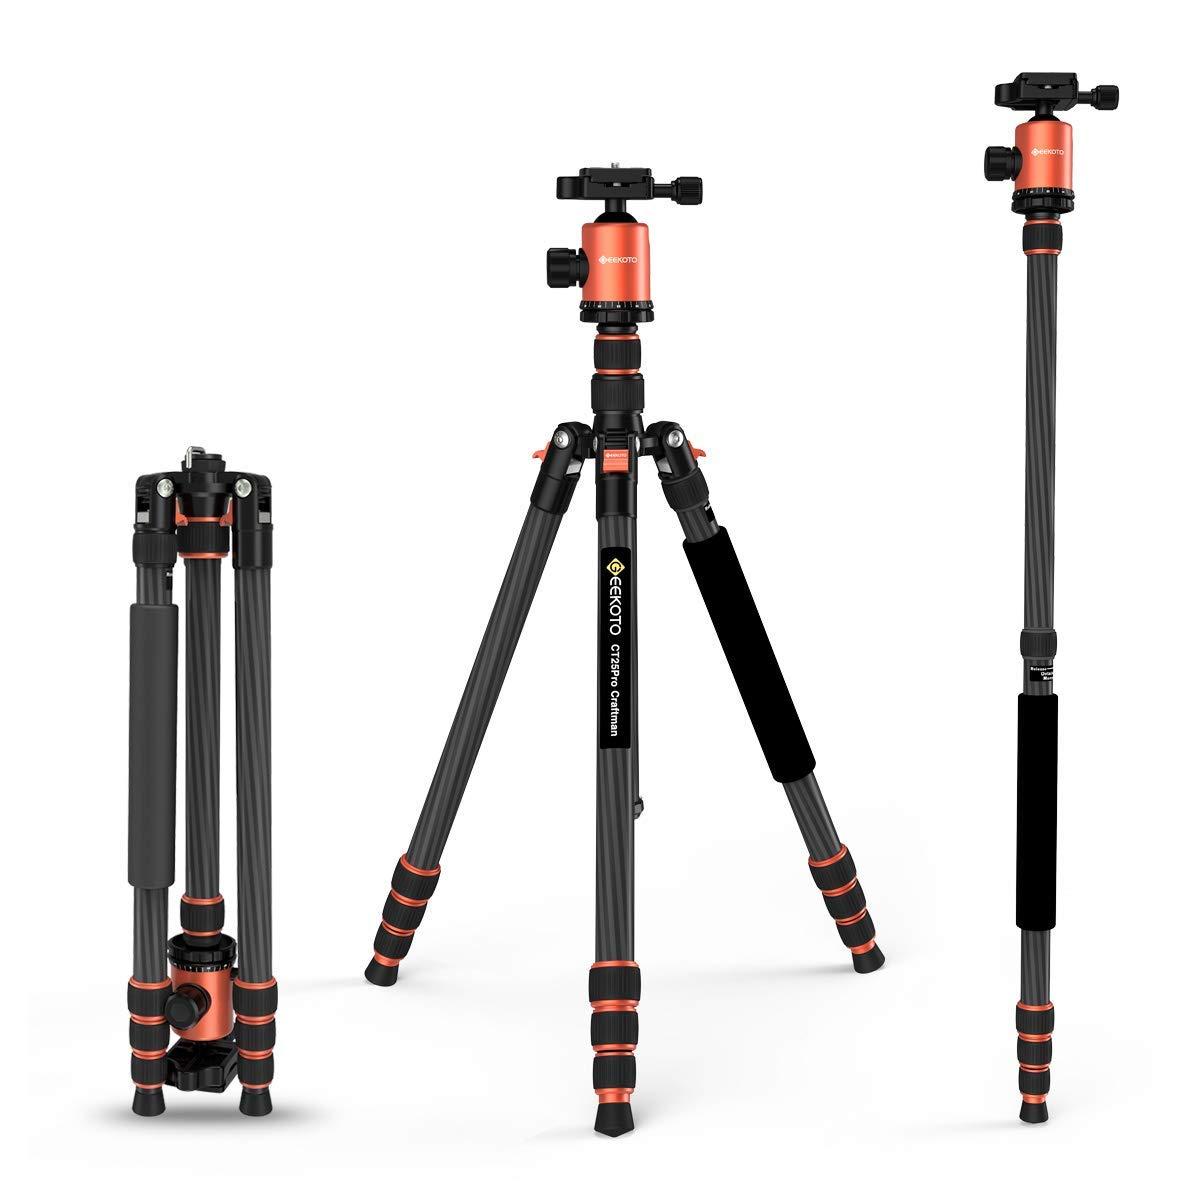 GEEKOTO 79インチカーボンファイバーカメラ三脚一脚 360度ボールヘッド付き 1/4インチクイックシュープレート デジタル一眼レフカメラ用バッグ プロフェッショナル三脚用 最大26.5ポンド (CT25Pro)   B07H7GH9HR